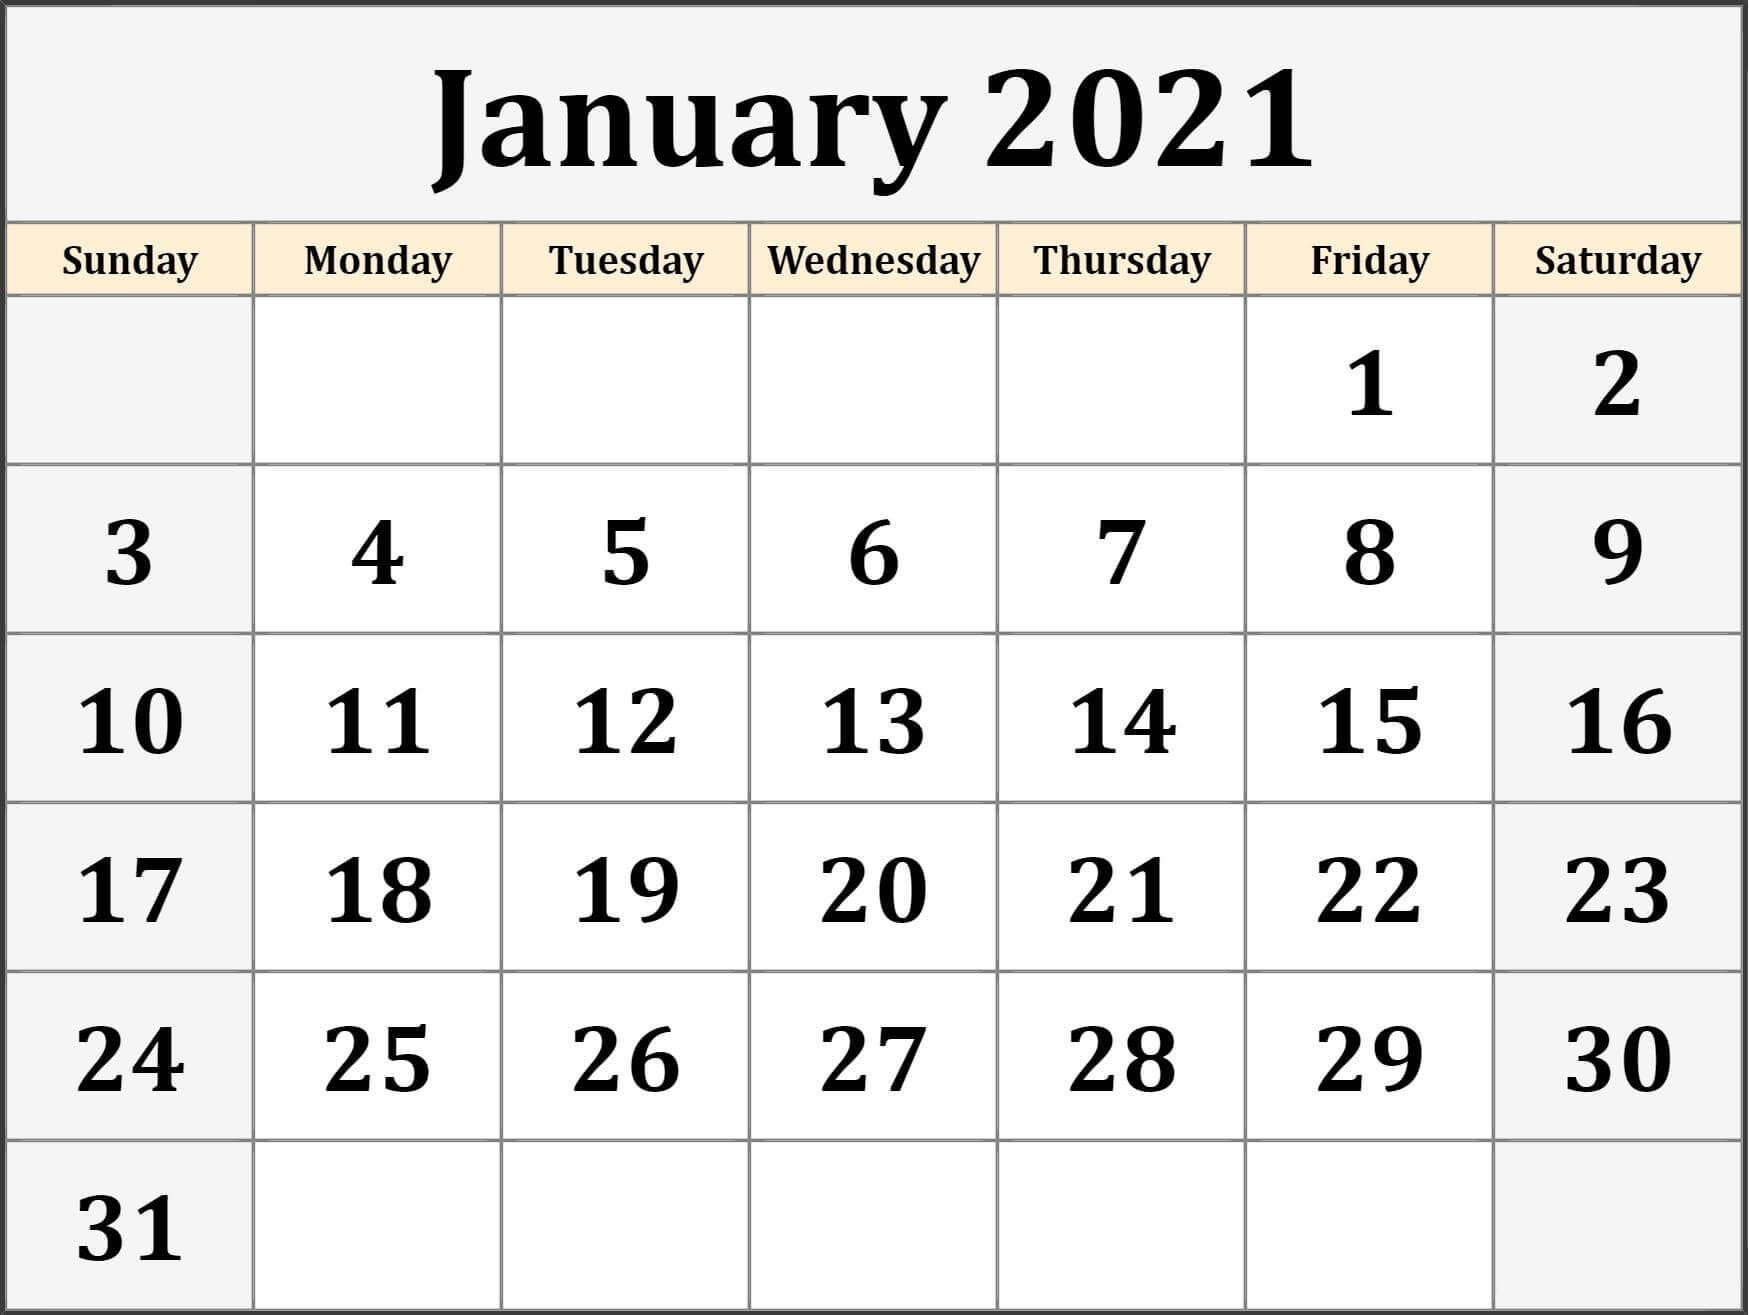 January 2021 Calendar Template Printable Holidays Images  Word January 2021 Template